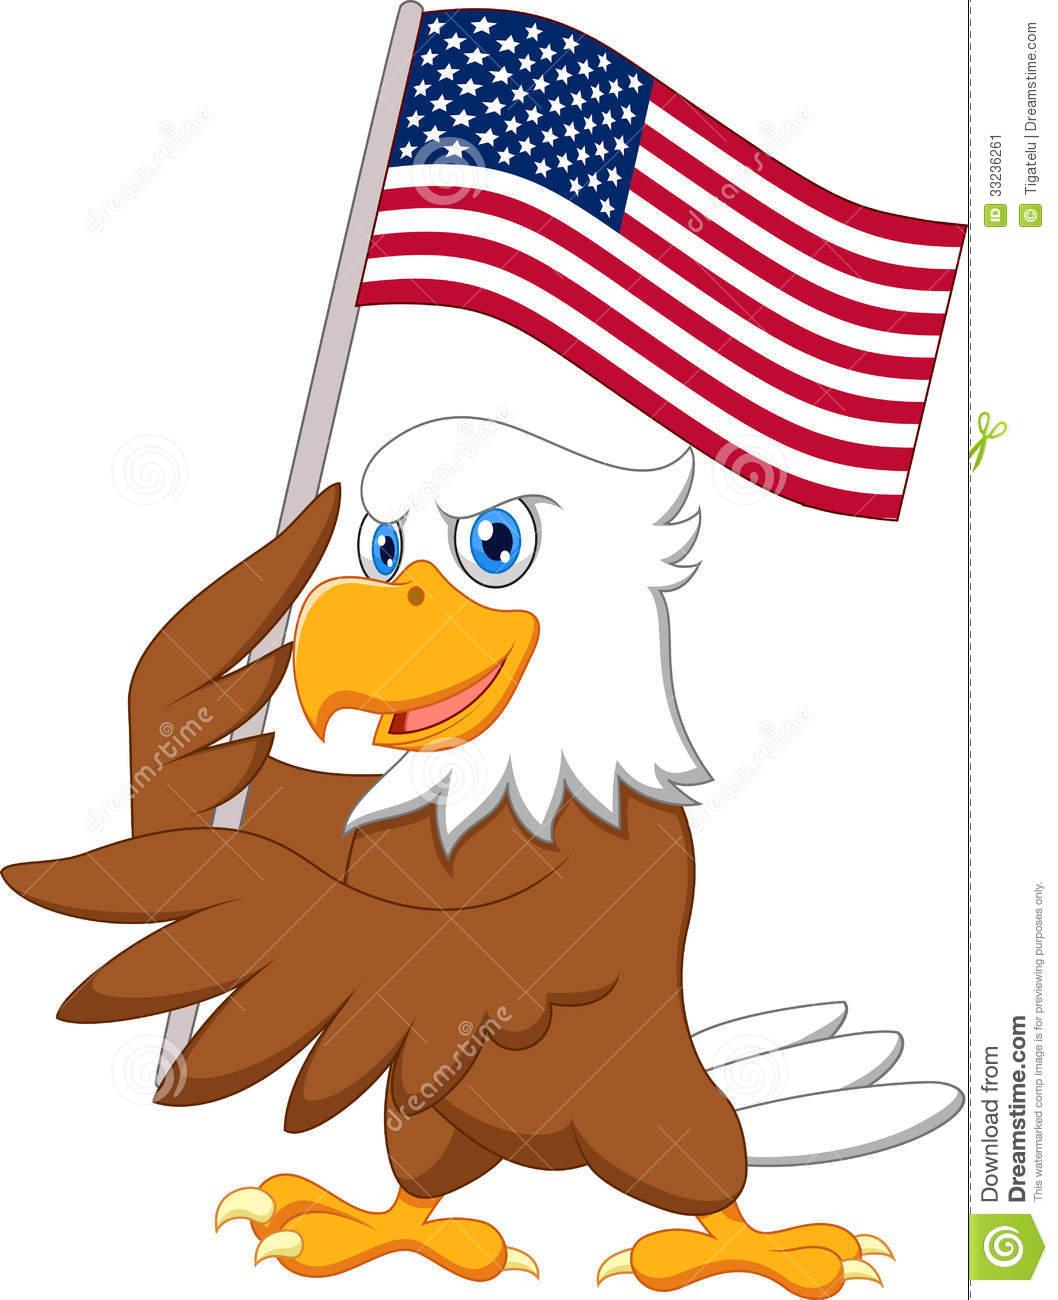 clip art american flag eagle - photo #22